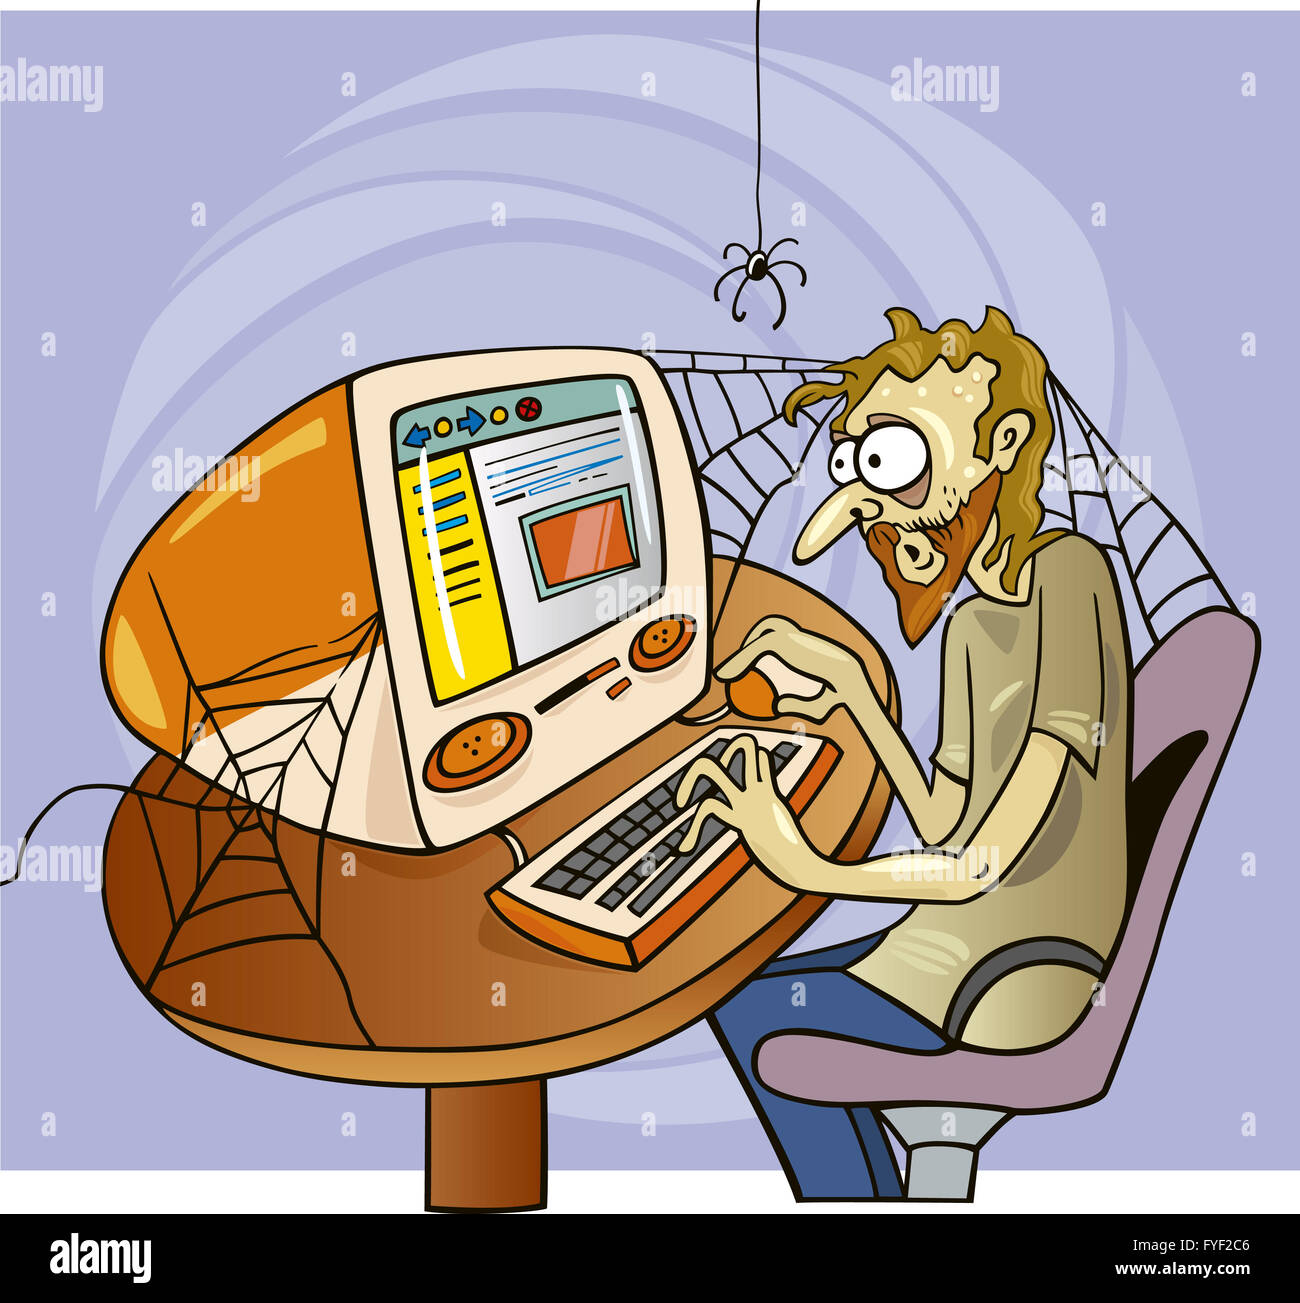 internet maniac - Stock Image